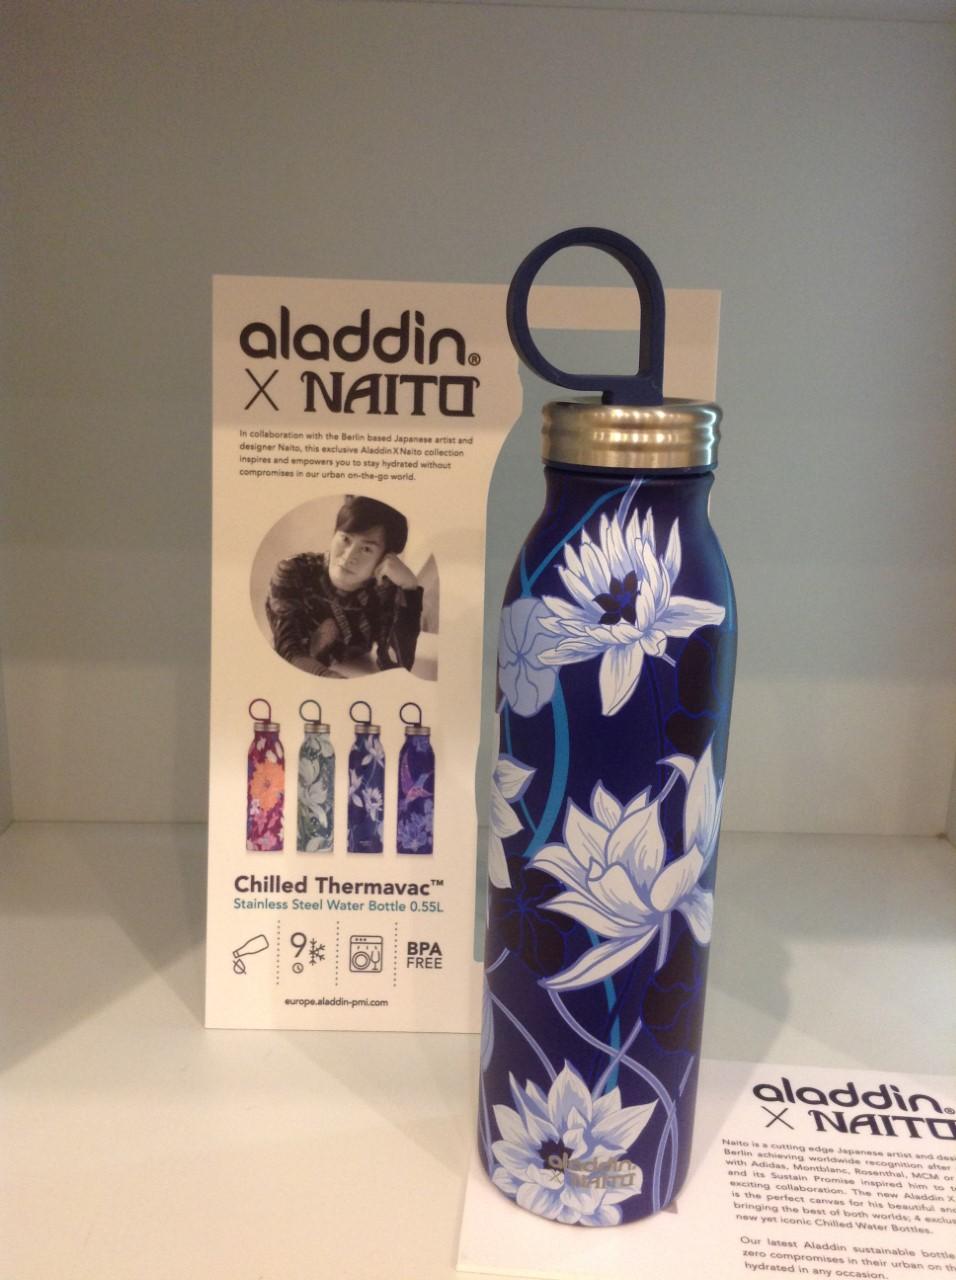 Aladdin x NAITO